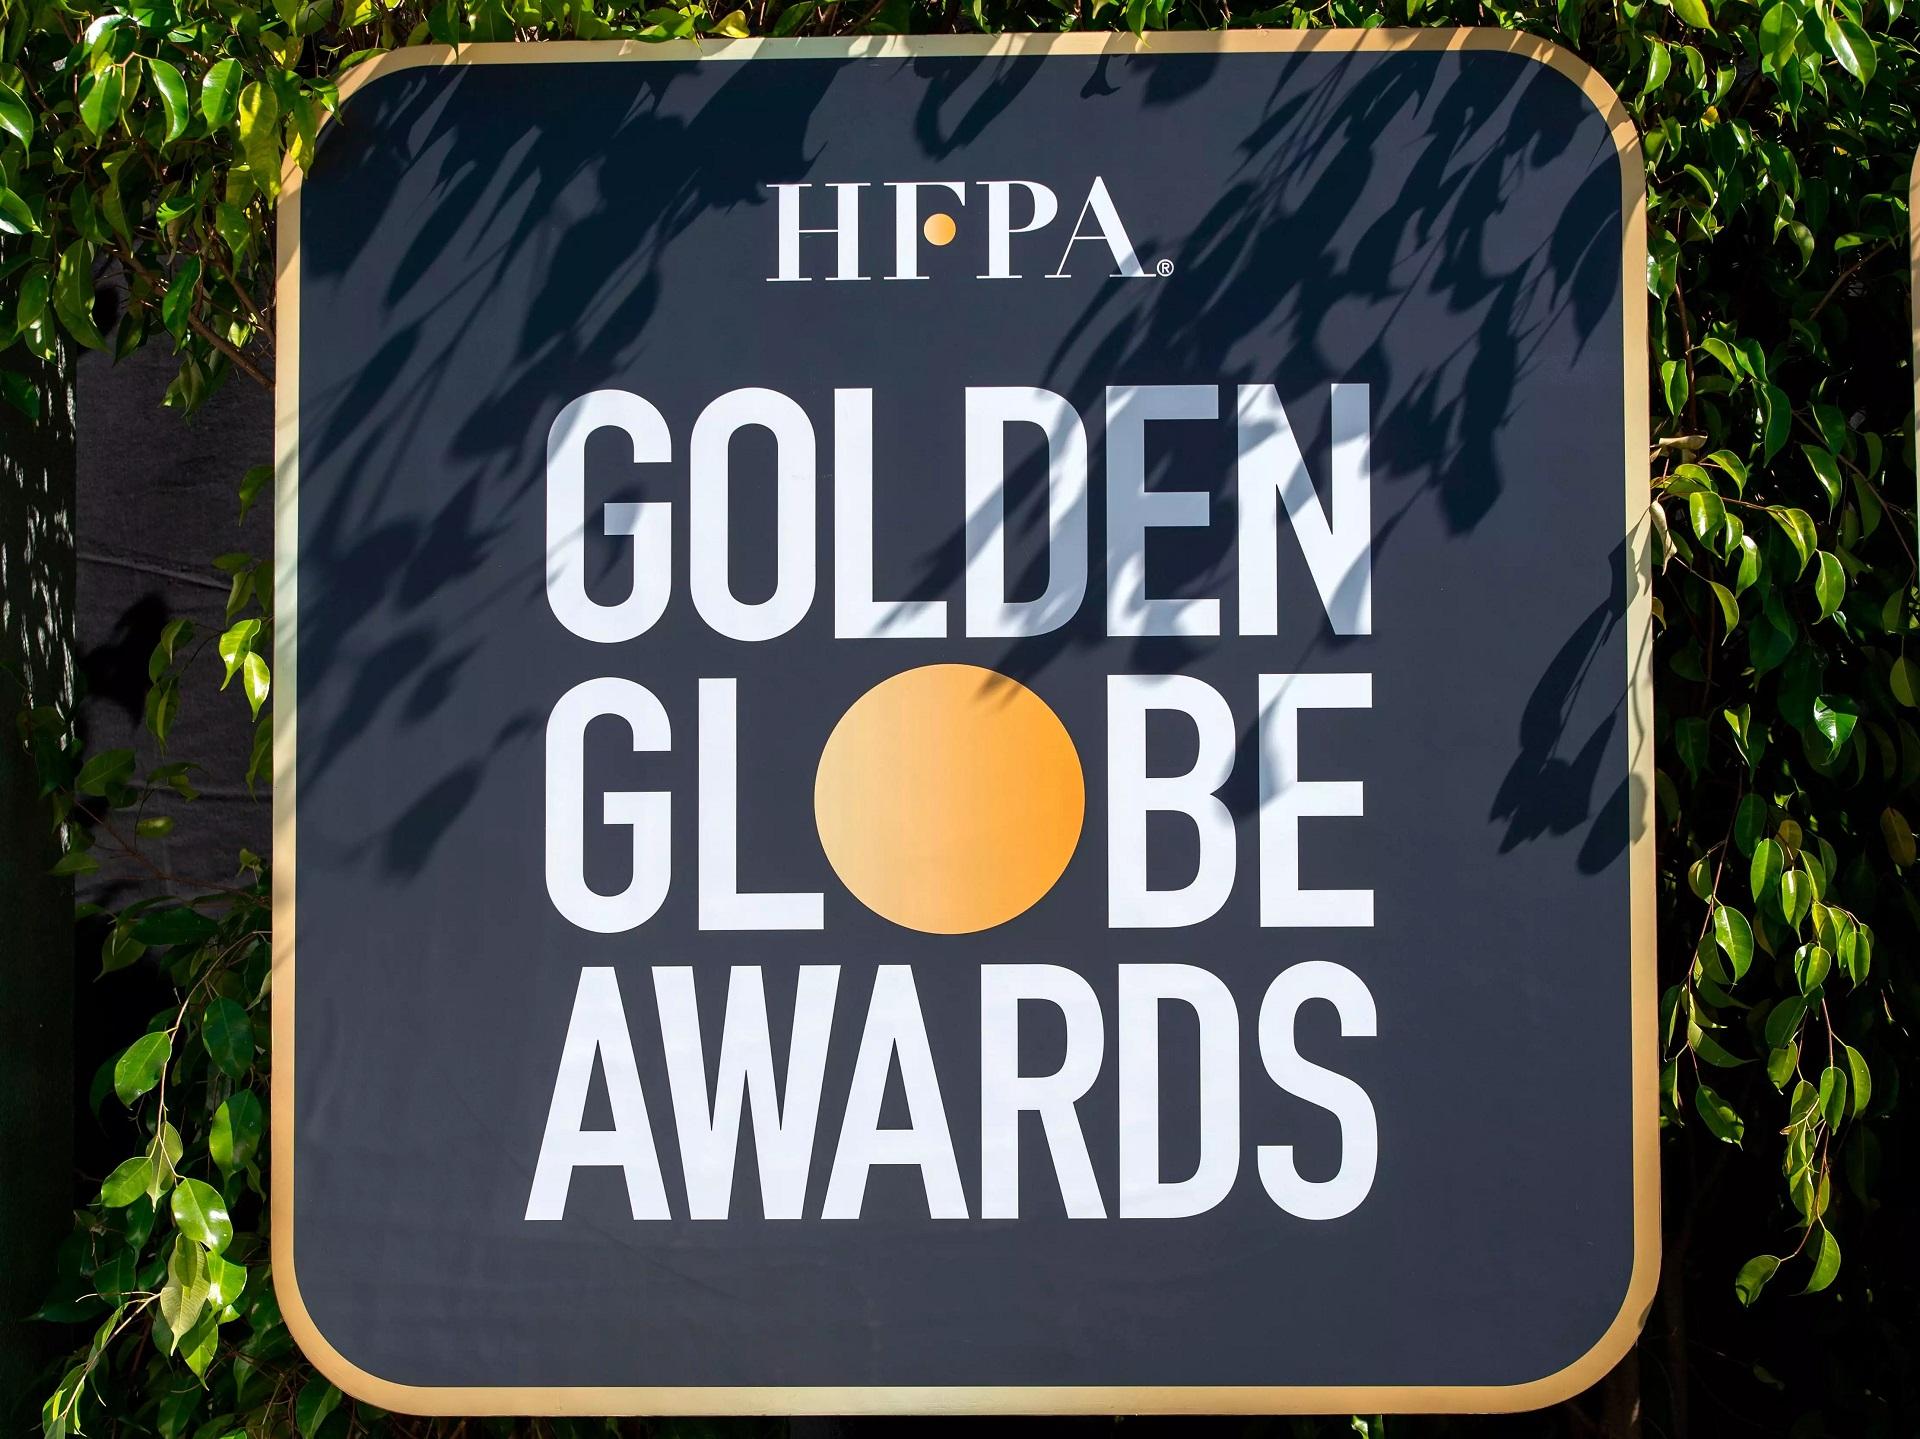 golden globe scarlett johansson mark ruffalo